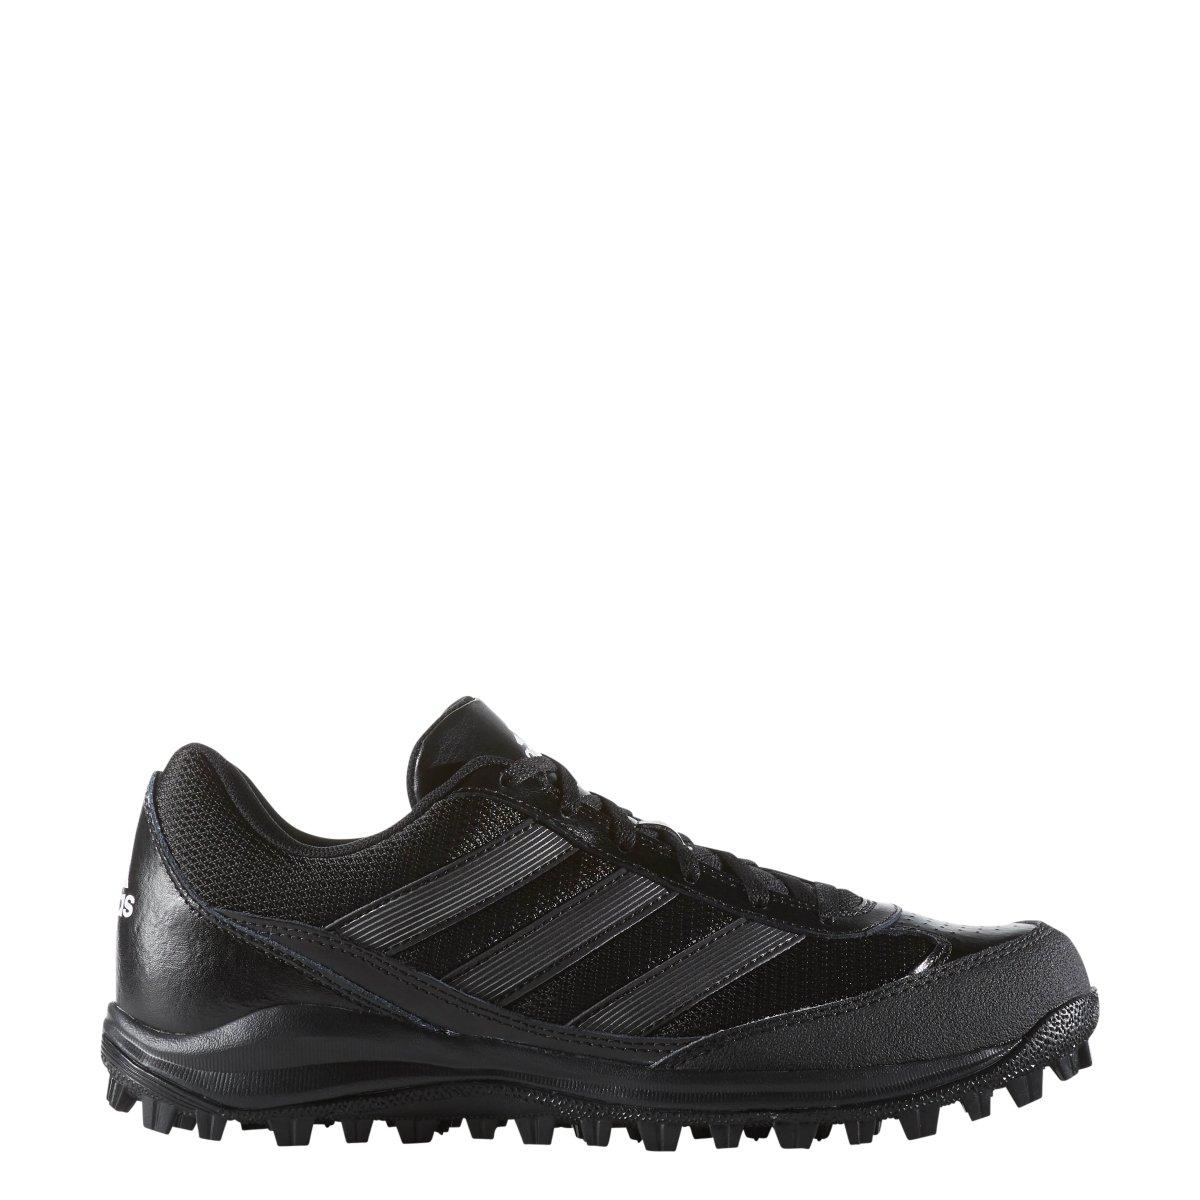 adidas Performance Men's Turf Hog LX Low Football Cleat,Black/Titaniam/White,7.5 M US